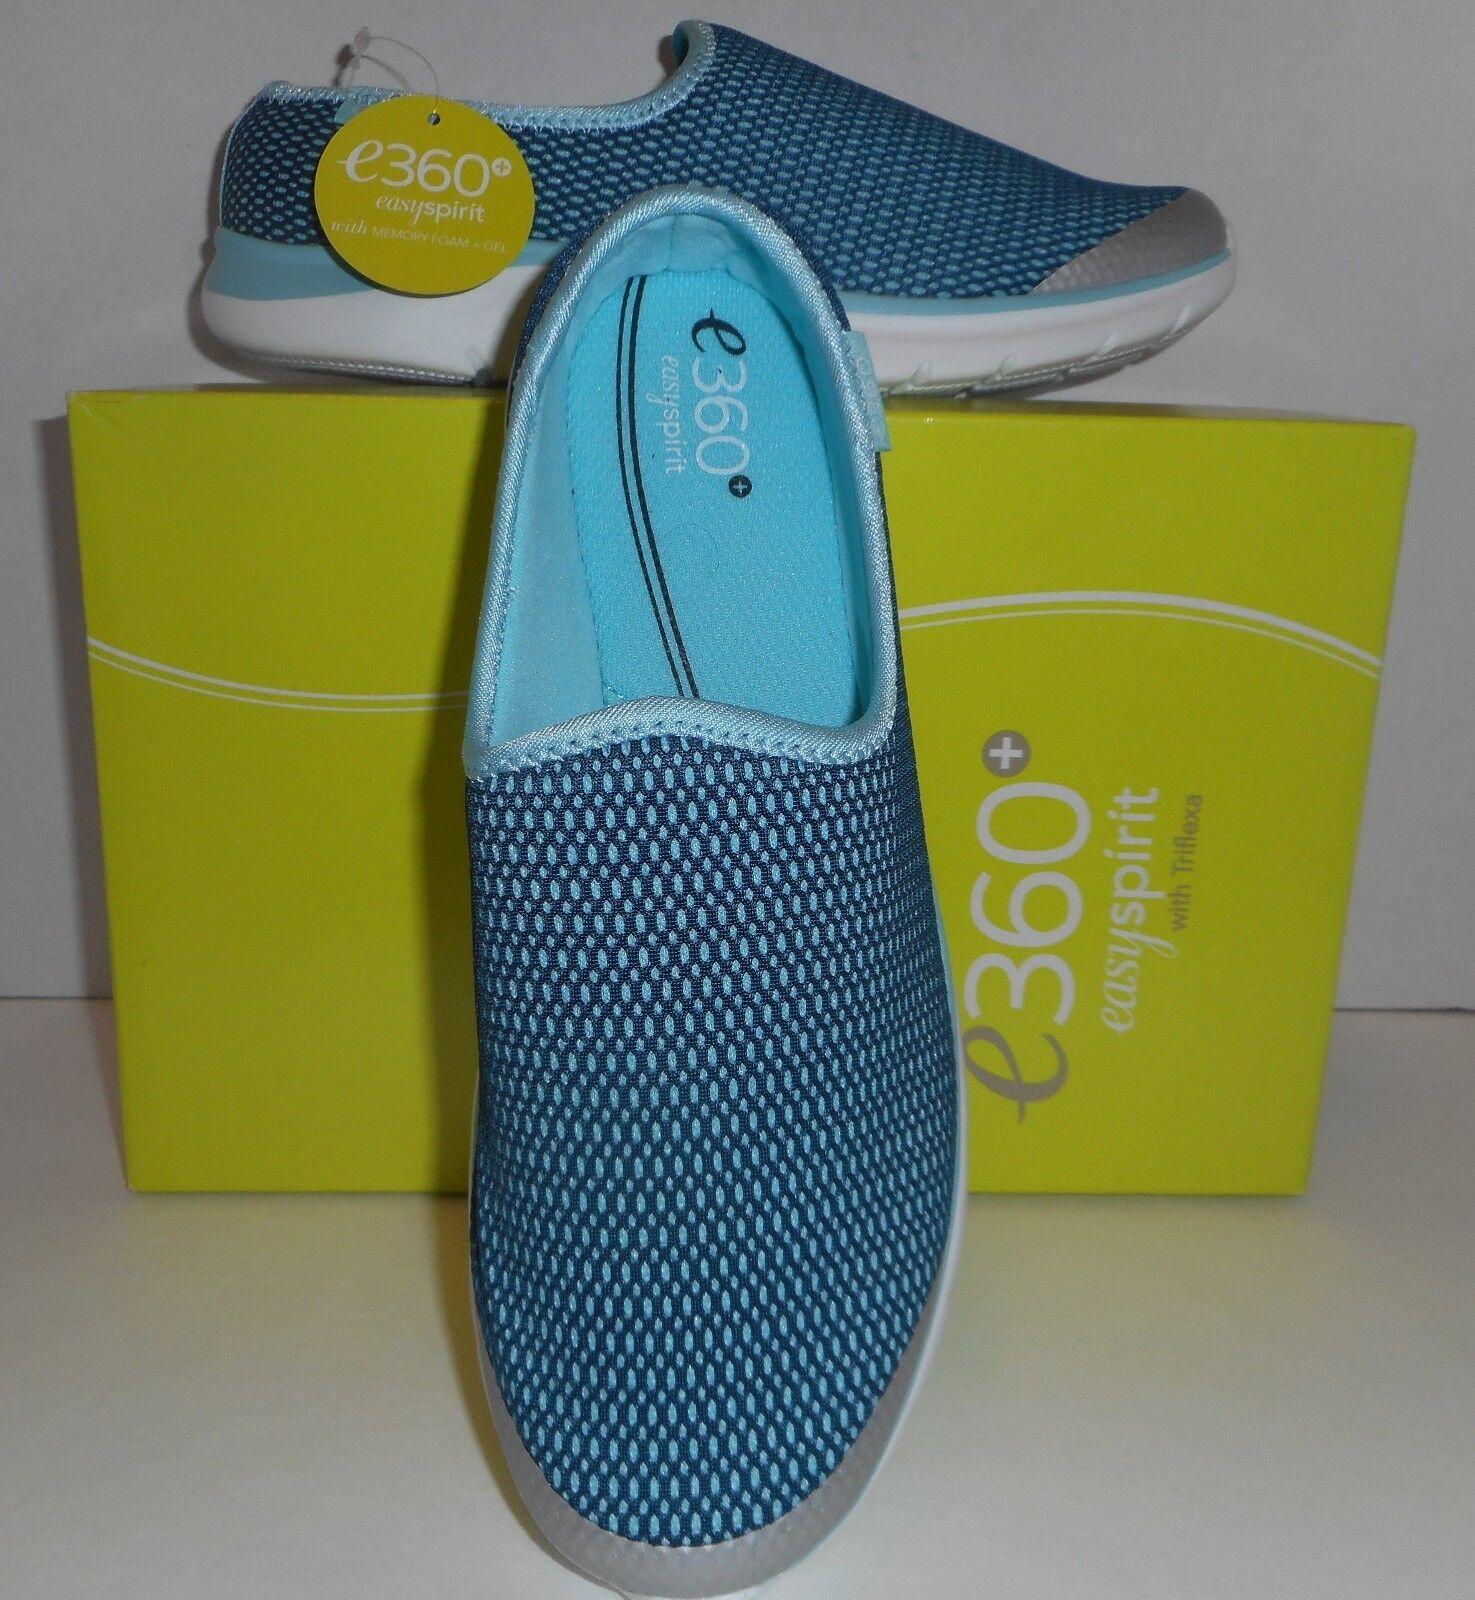 NIB Easy Spirit e360 Make Moves Women Round Toe Canvas Blue Walking Shoe